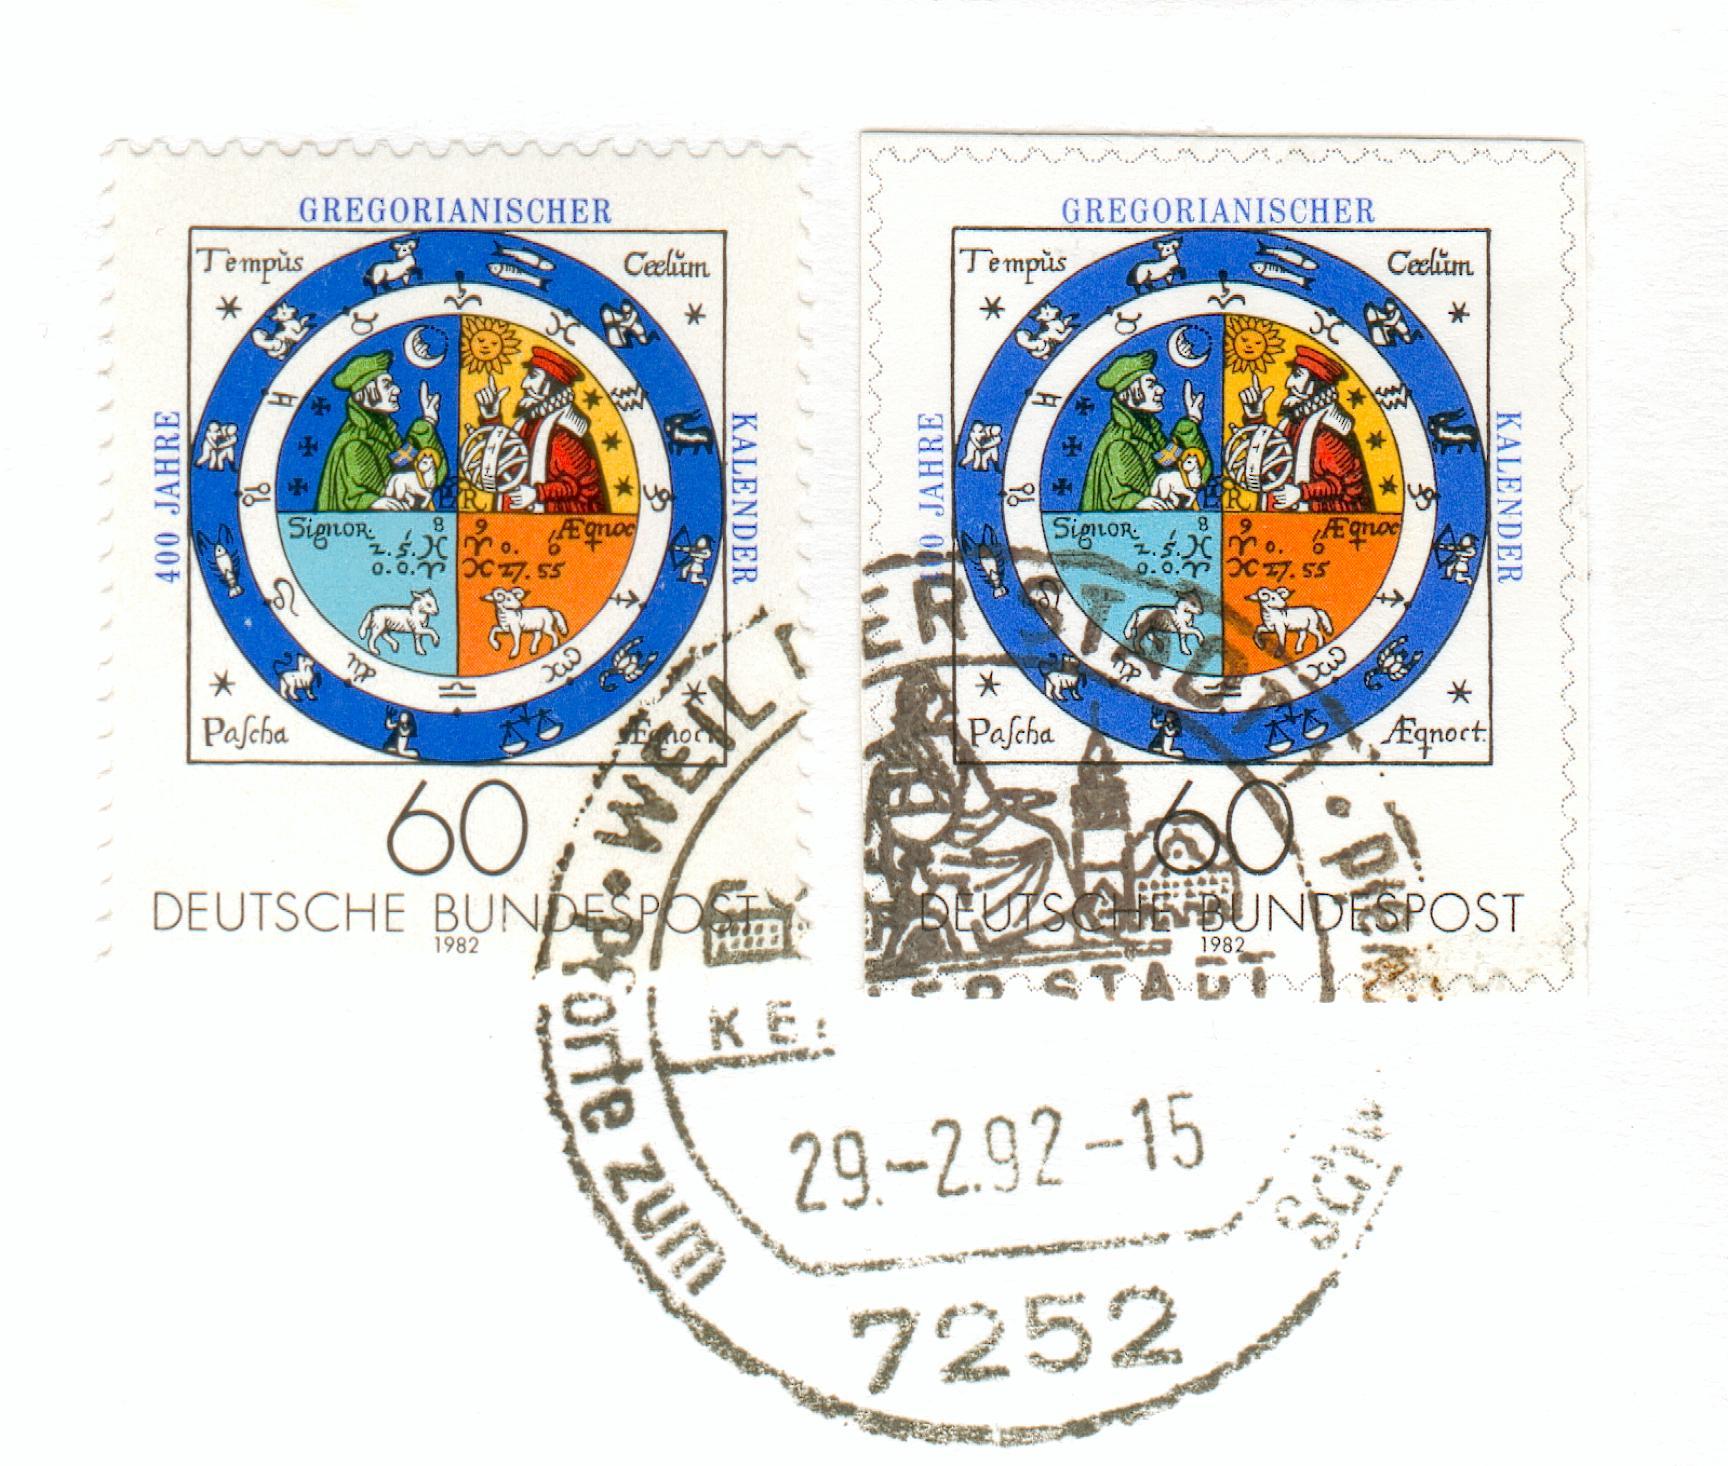 gf71-1.jpg